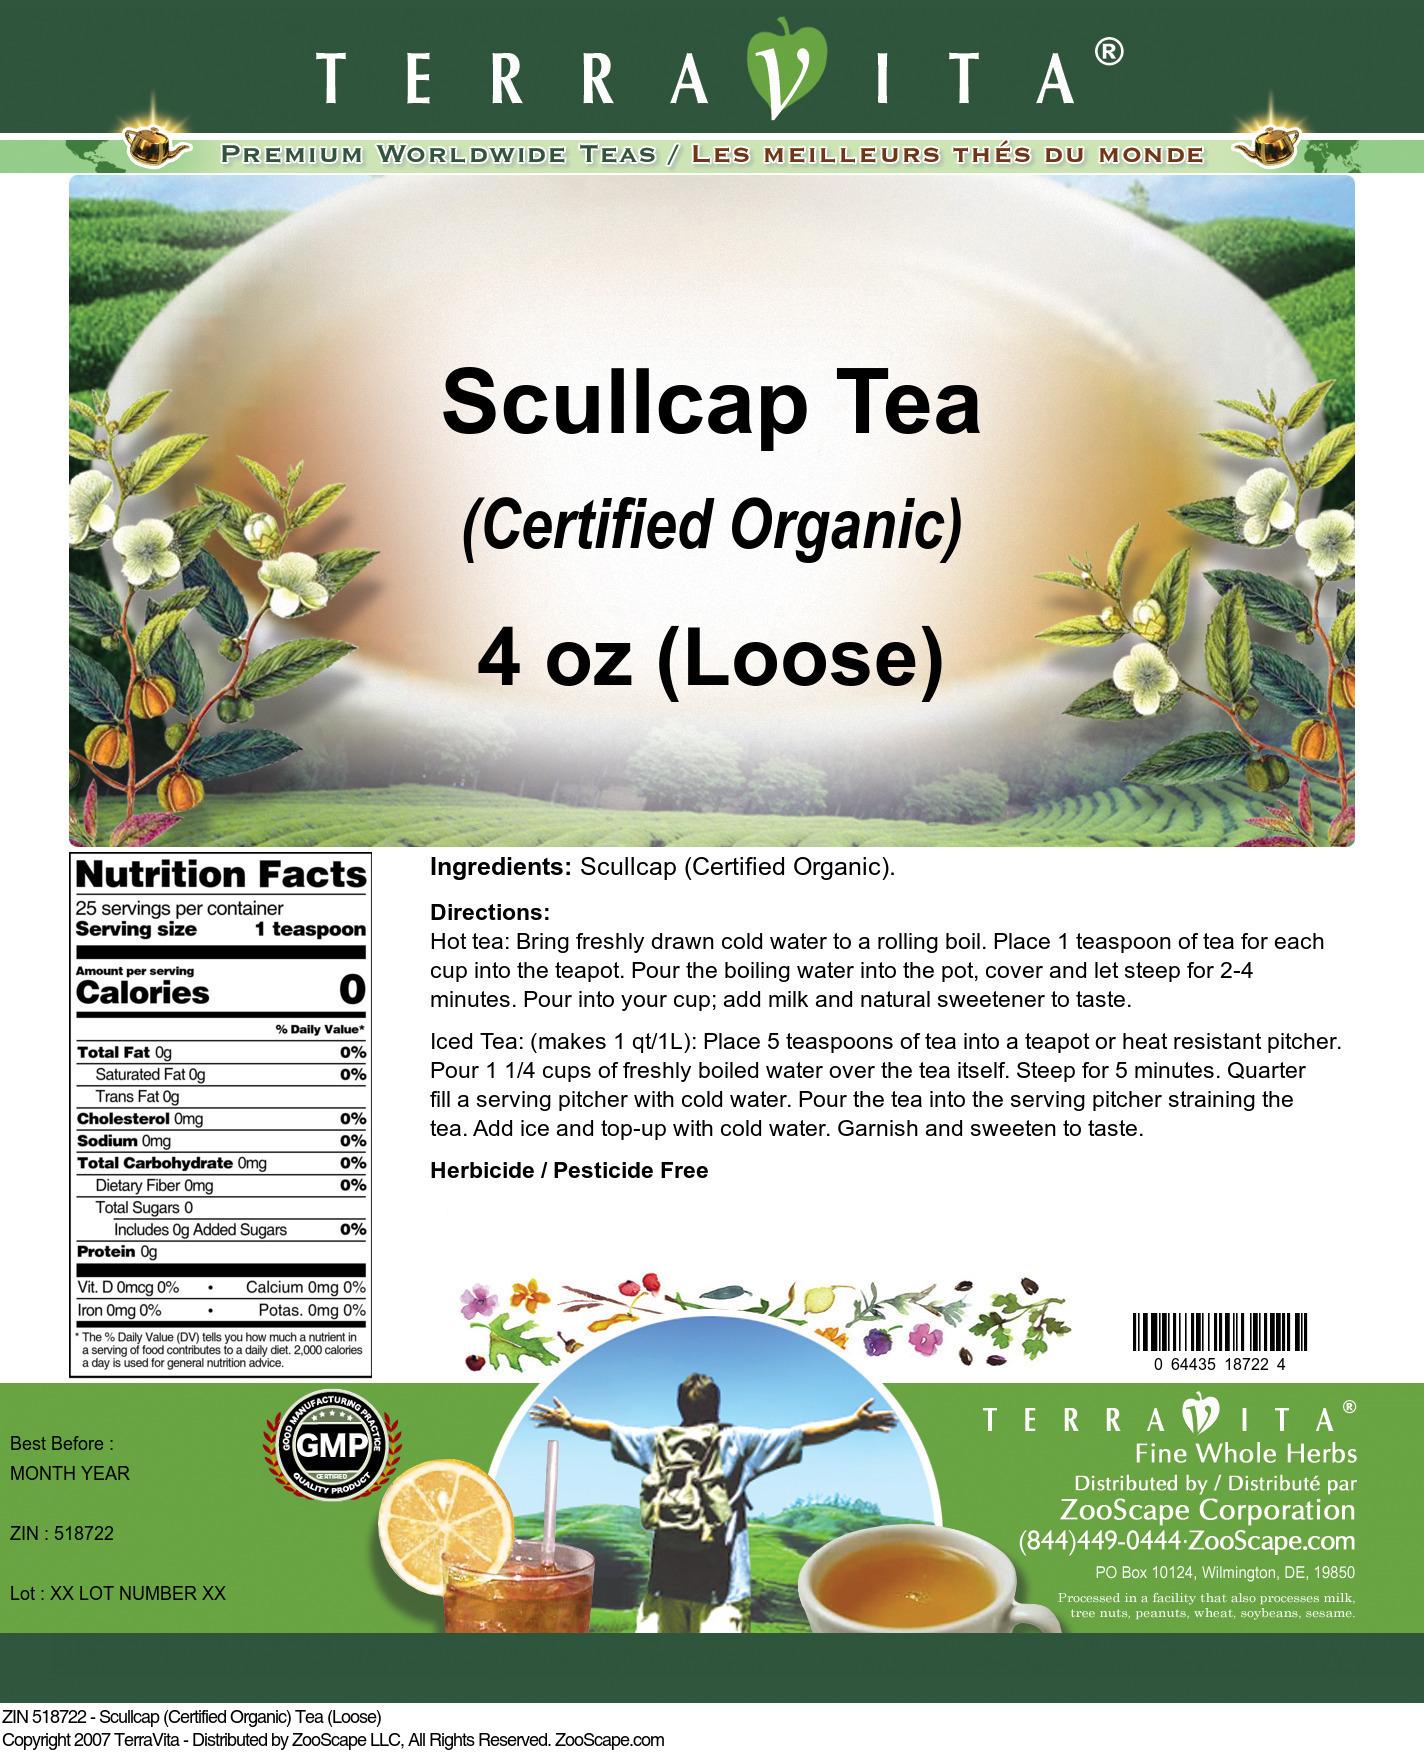 Scullcap (Certified Organic) Tea (Loose)